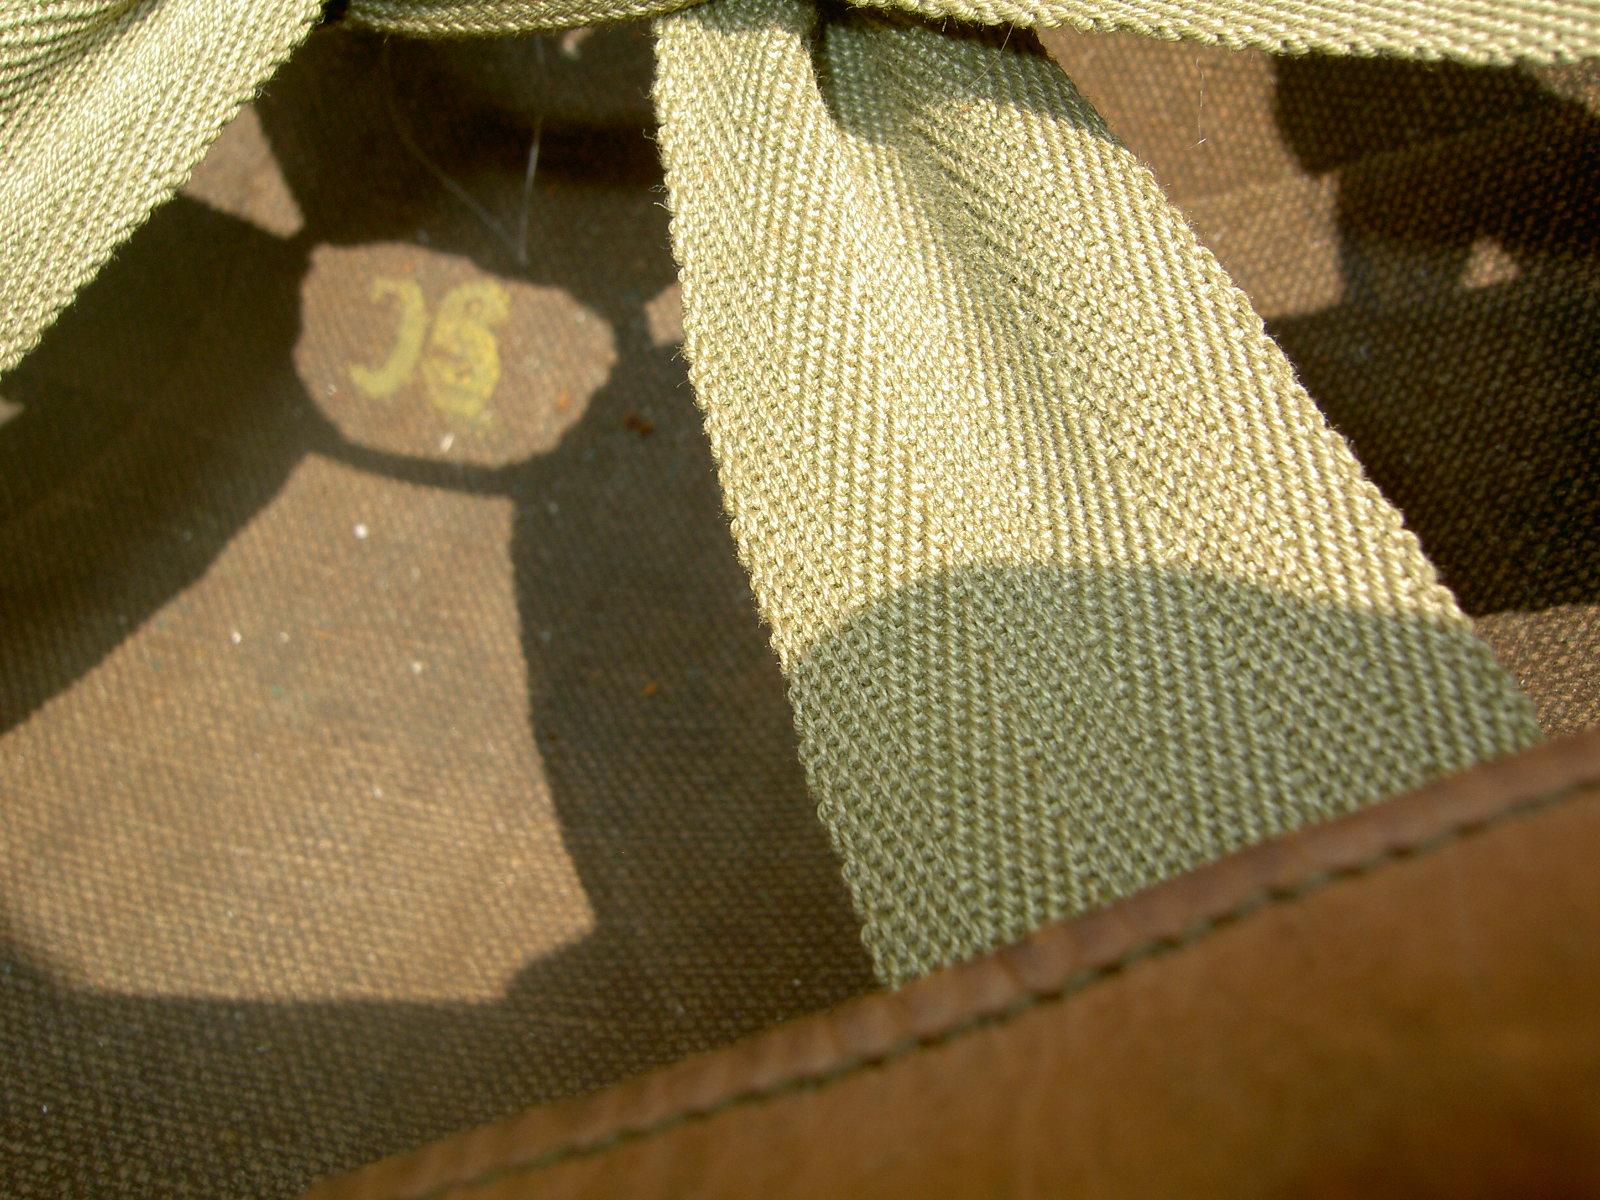 90th IDPG Rewebbing the M1 Helmet Liner: Introduction